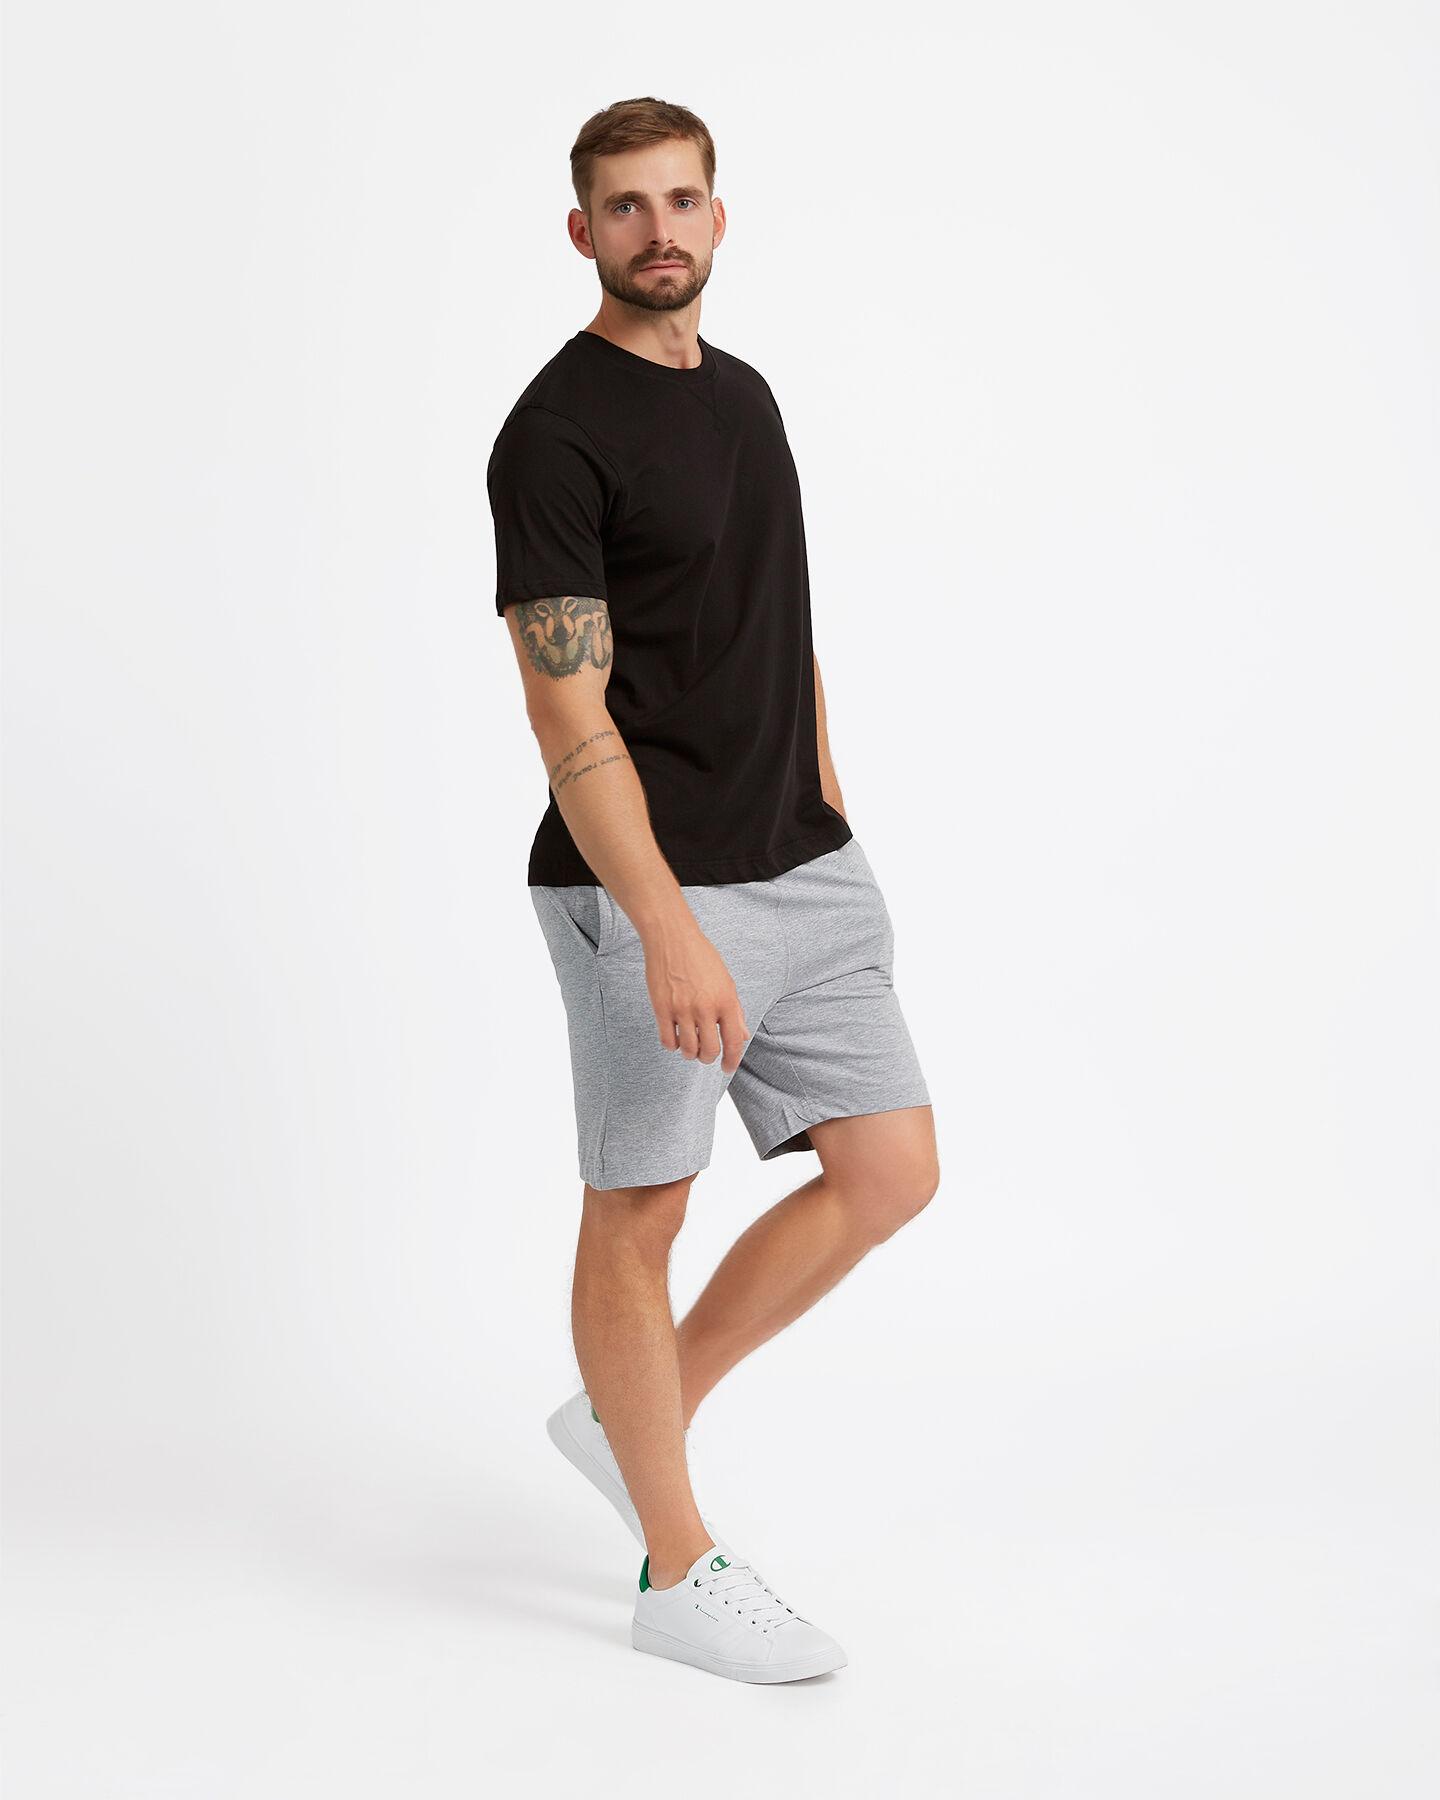 T-Shirt ABC GIROCOLLO M S1298307 scatto 3